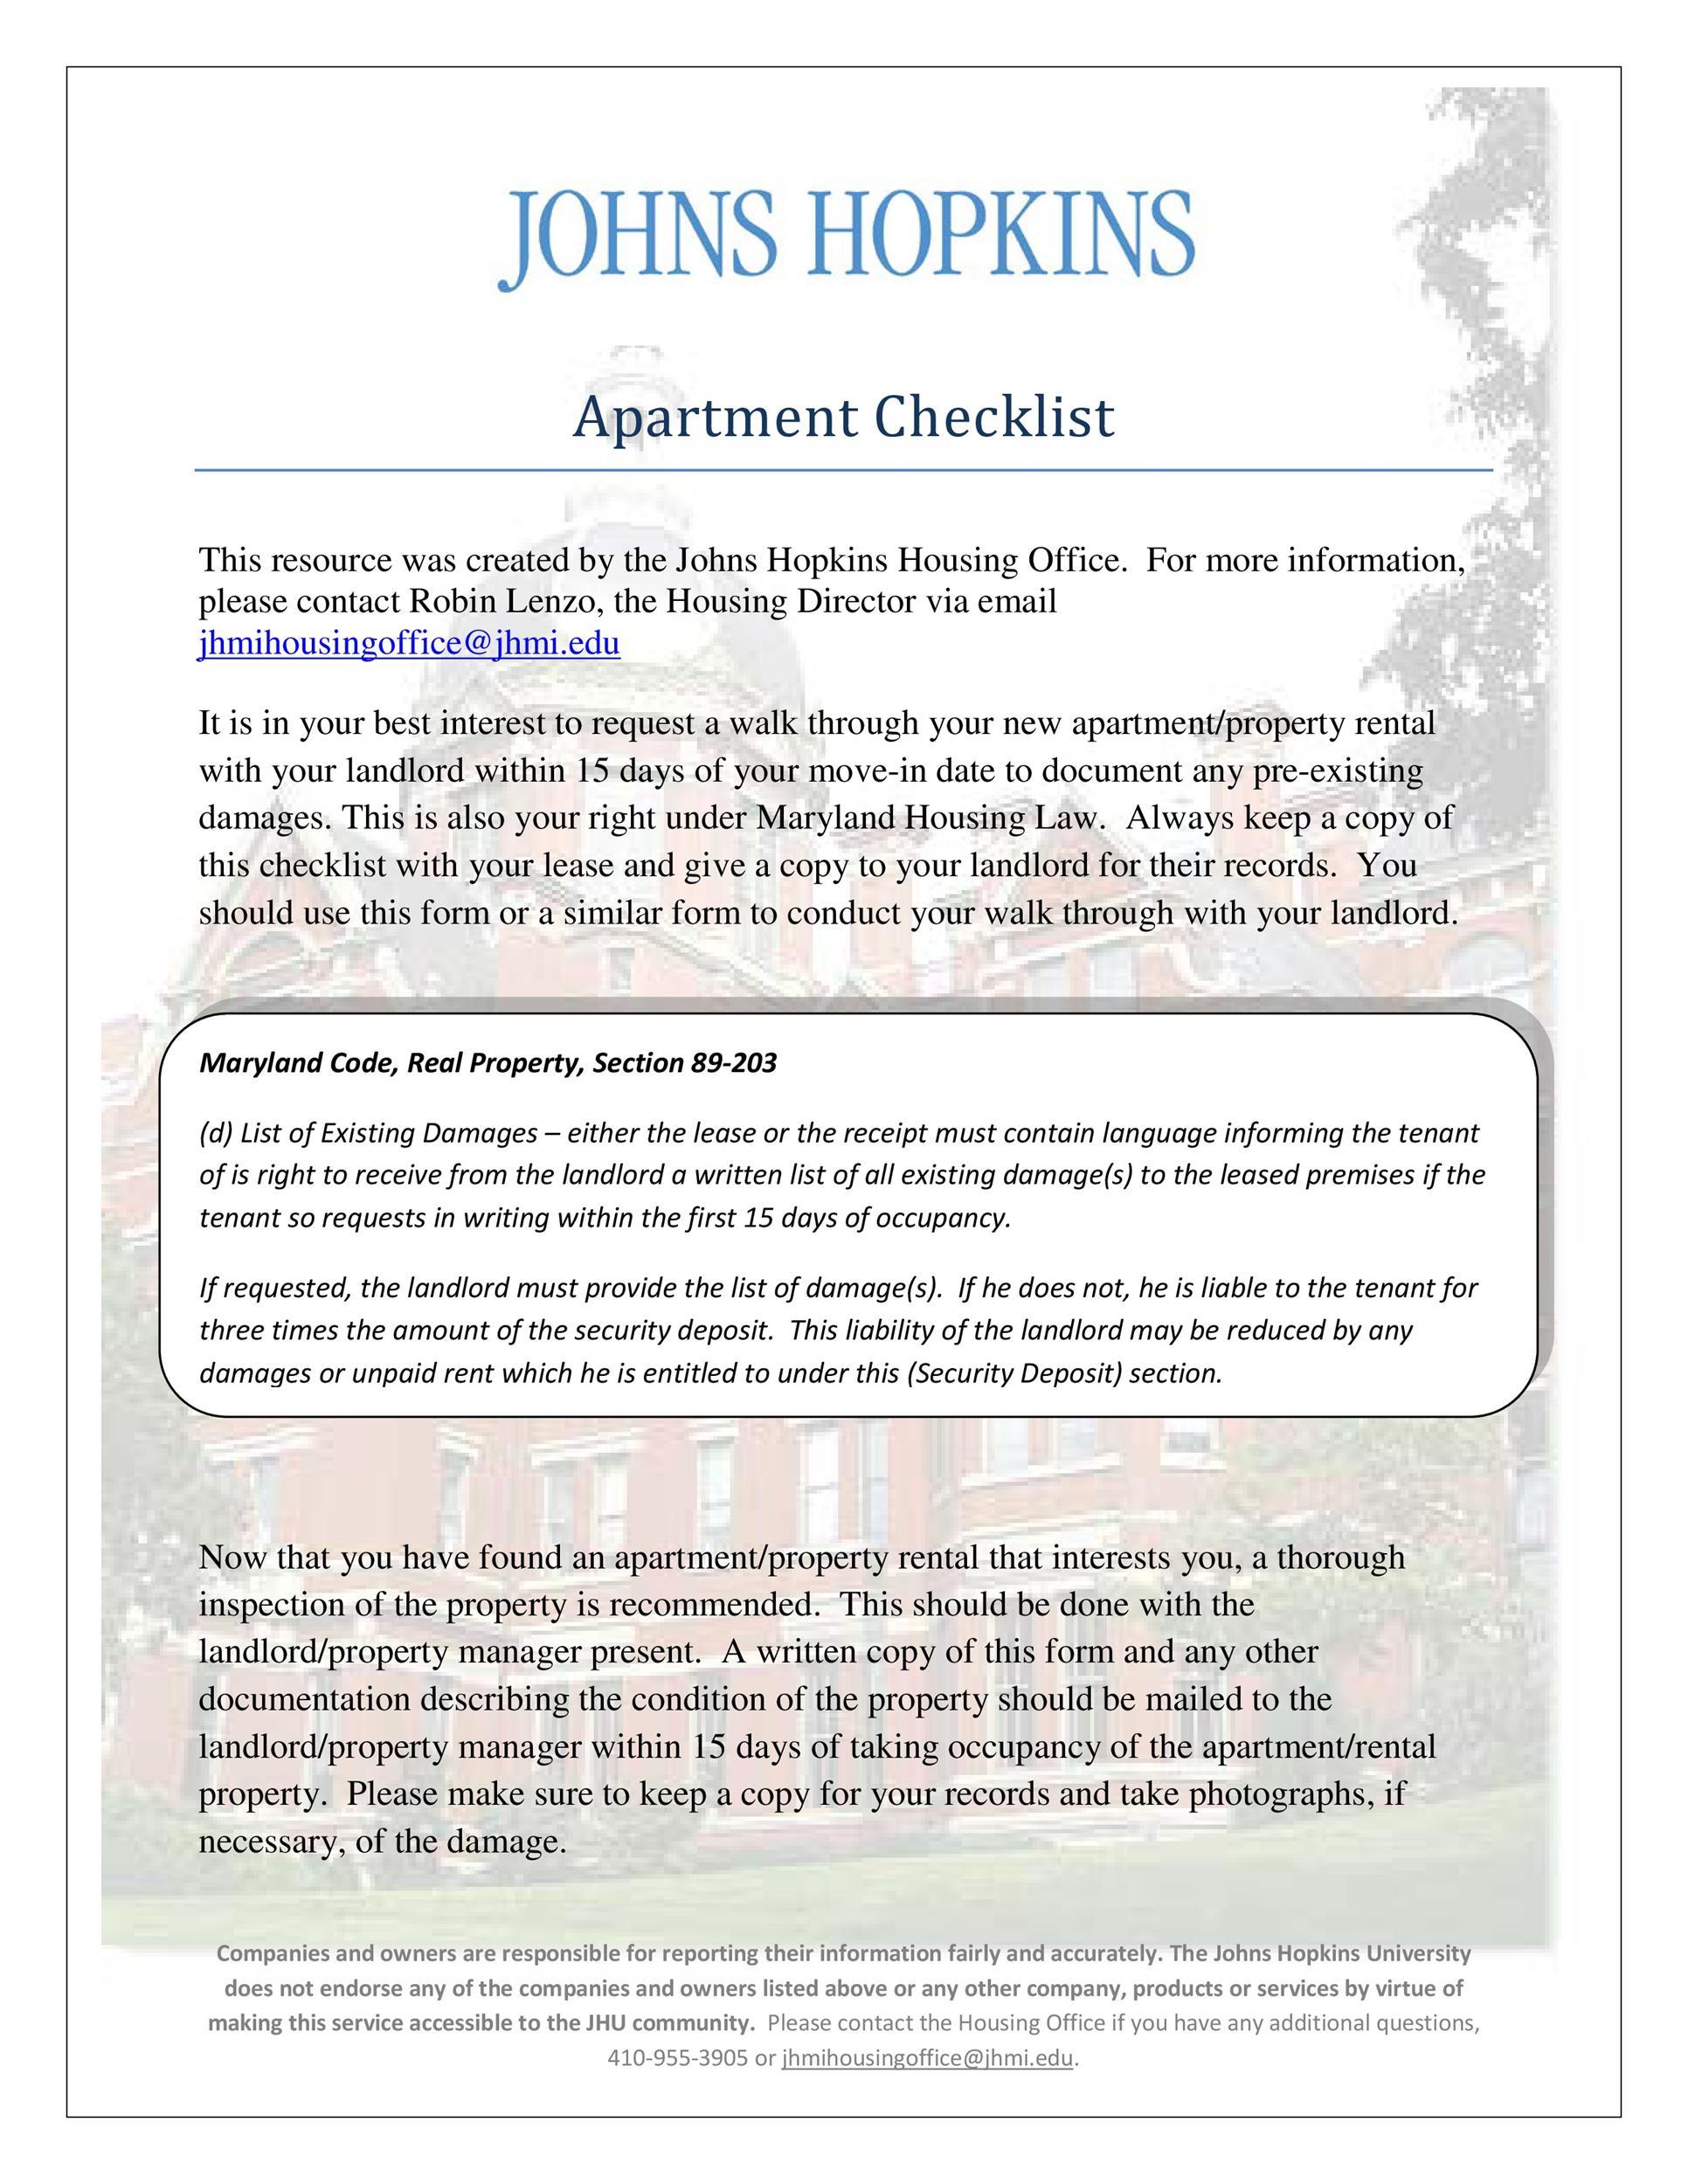 Free apartment checklist 40